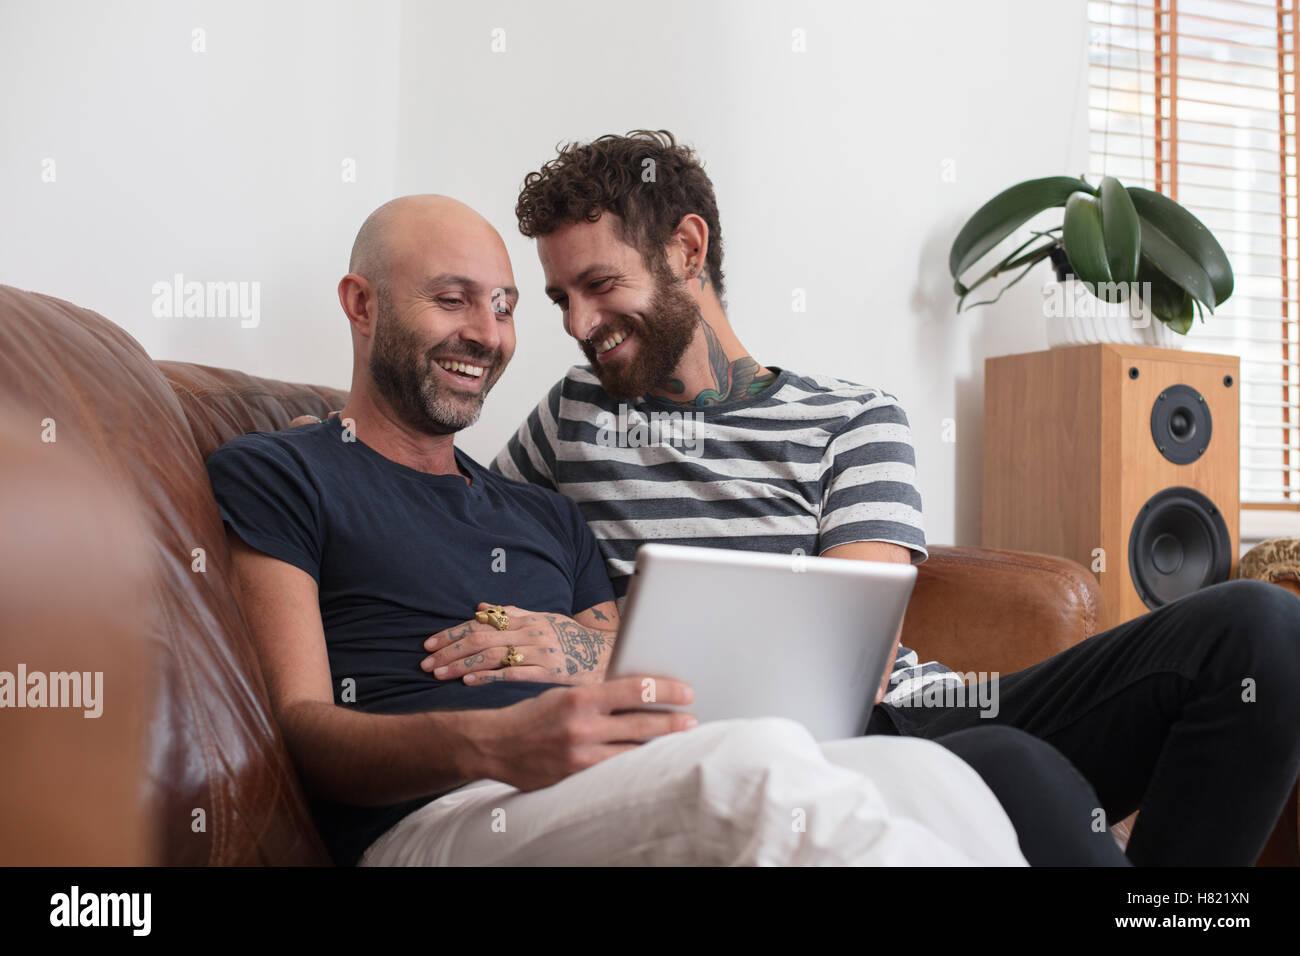 Gay paar saß auf Sofa, teilen Tablet kuscheln Stockbild